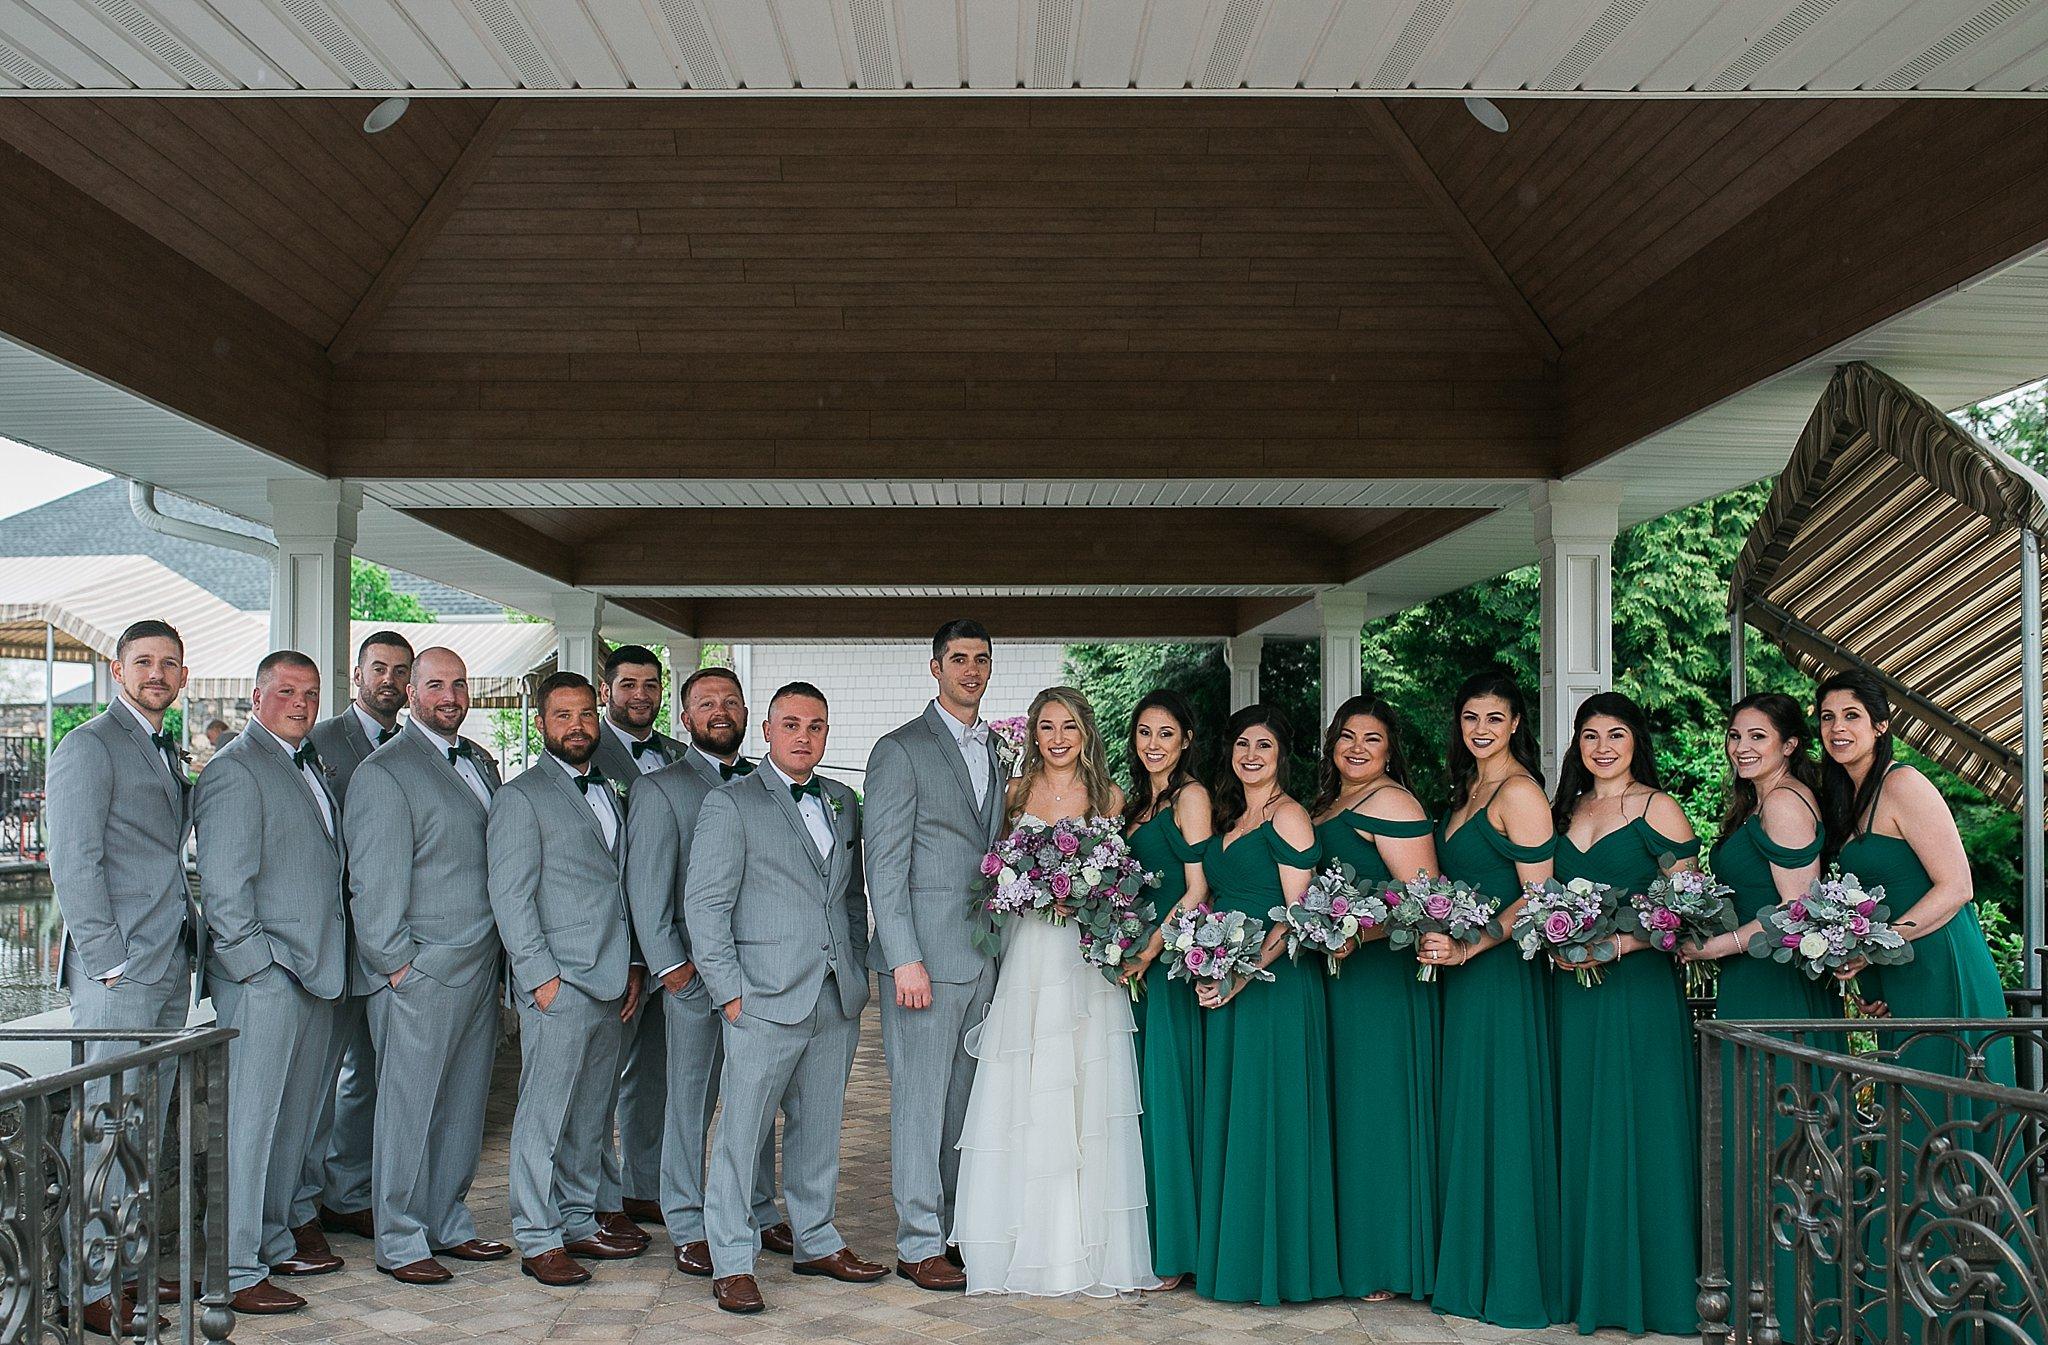 West Hills Country Club Wedding Hudson Valley Wedding Photographer Sweet Alice Photography 43.jpg